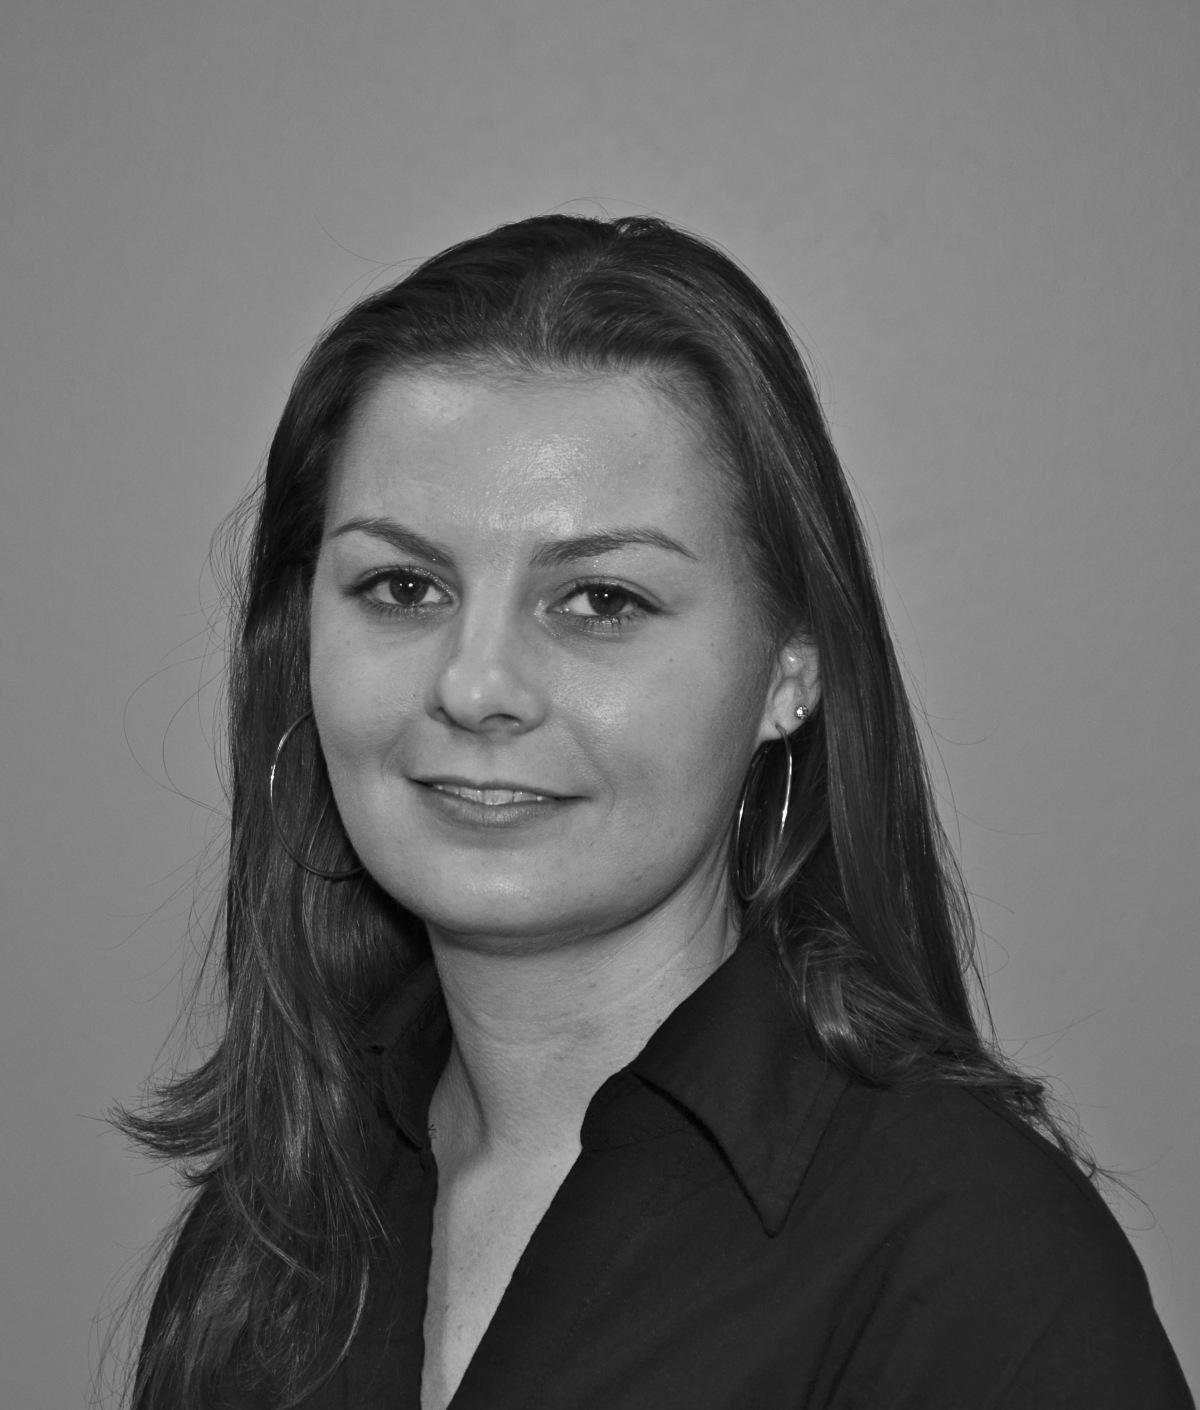 Ashley Garcia - Inside Sales Coordinator512-948-4100ashleygarcia@topequipment.net